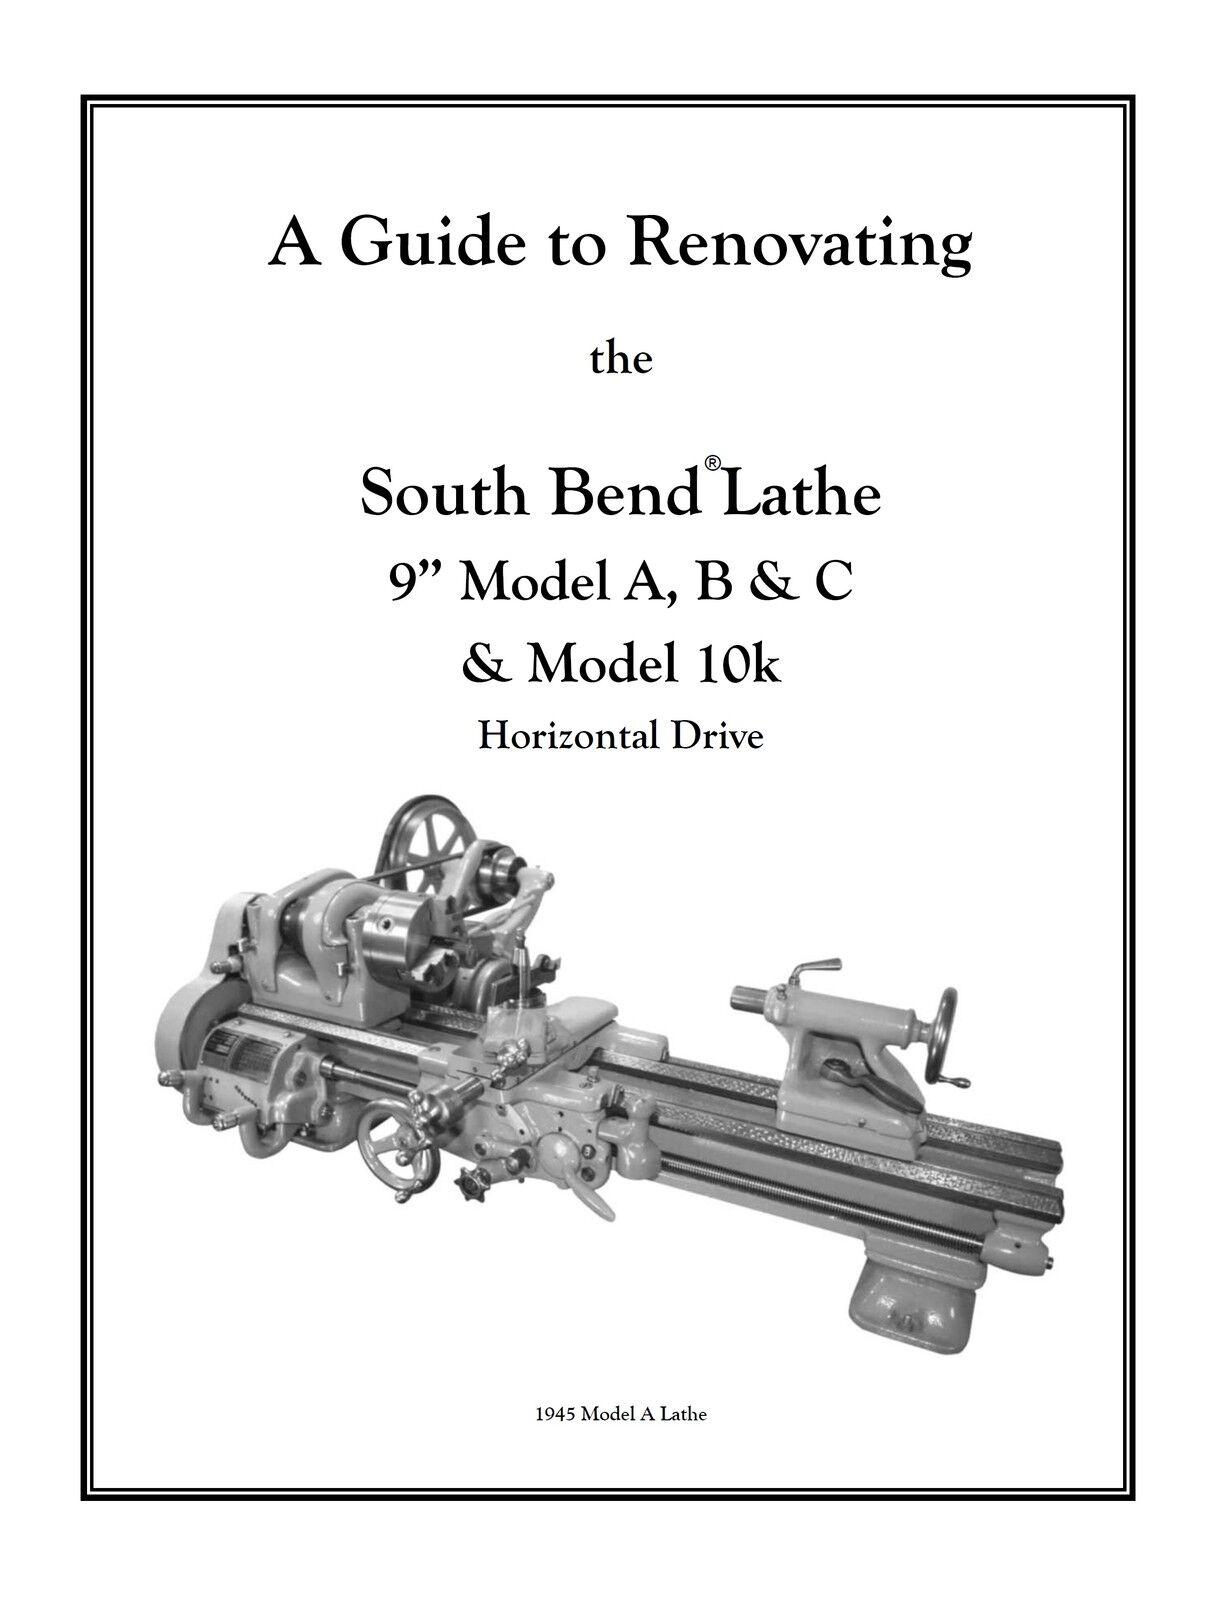 "REBUILD Book & Parts Kit for 9"" South Bend Lathe Model C"